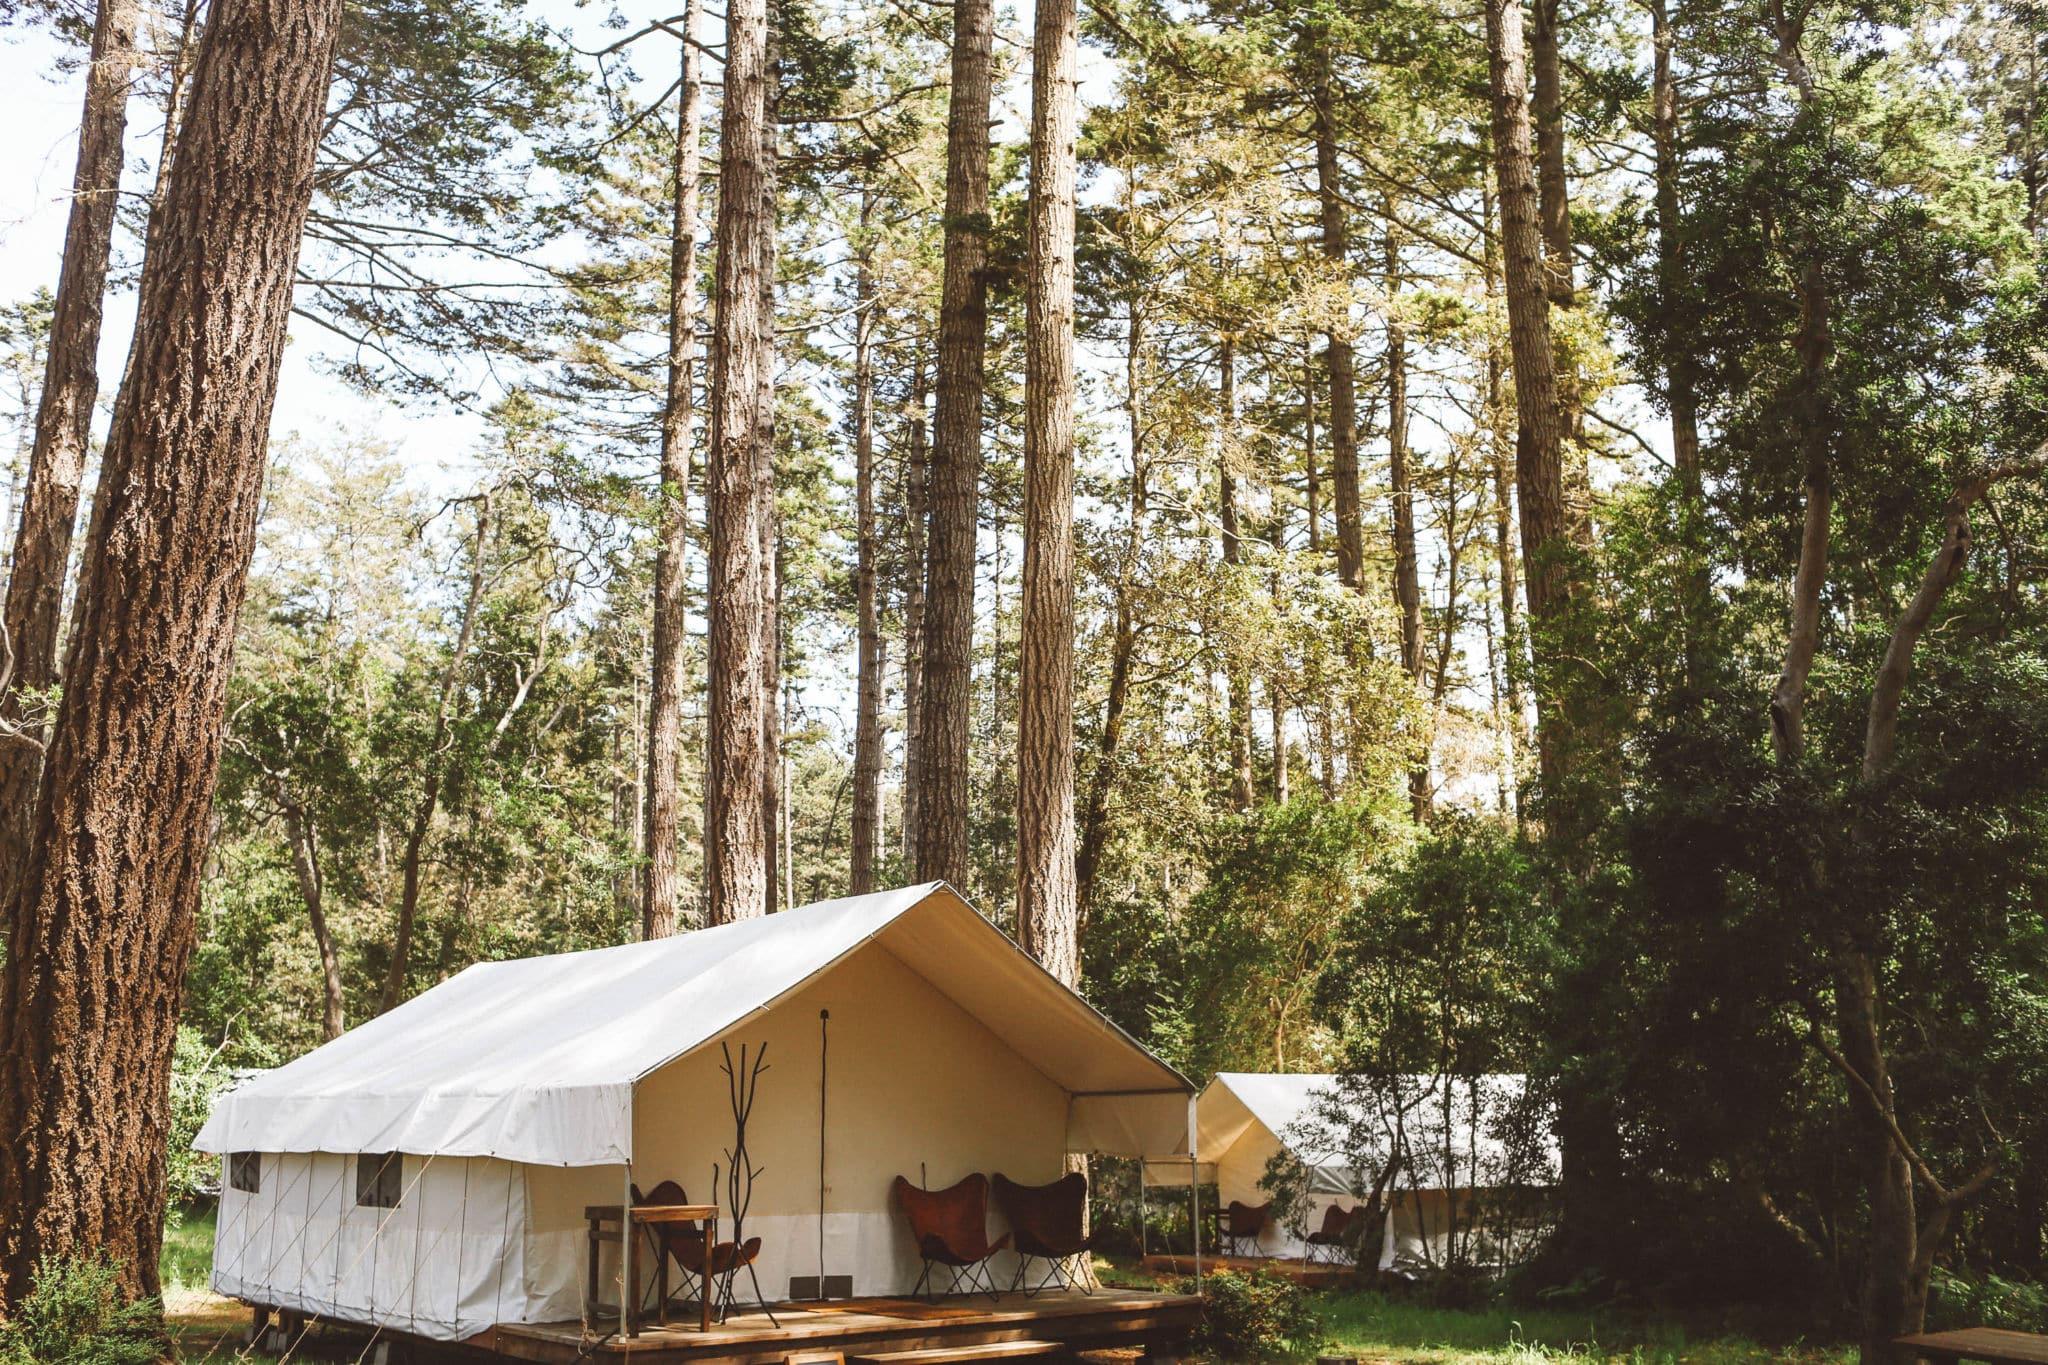 Glamping tent among fir trees